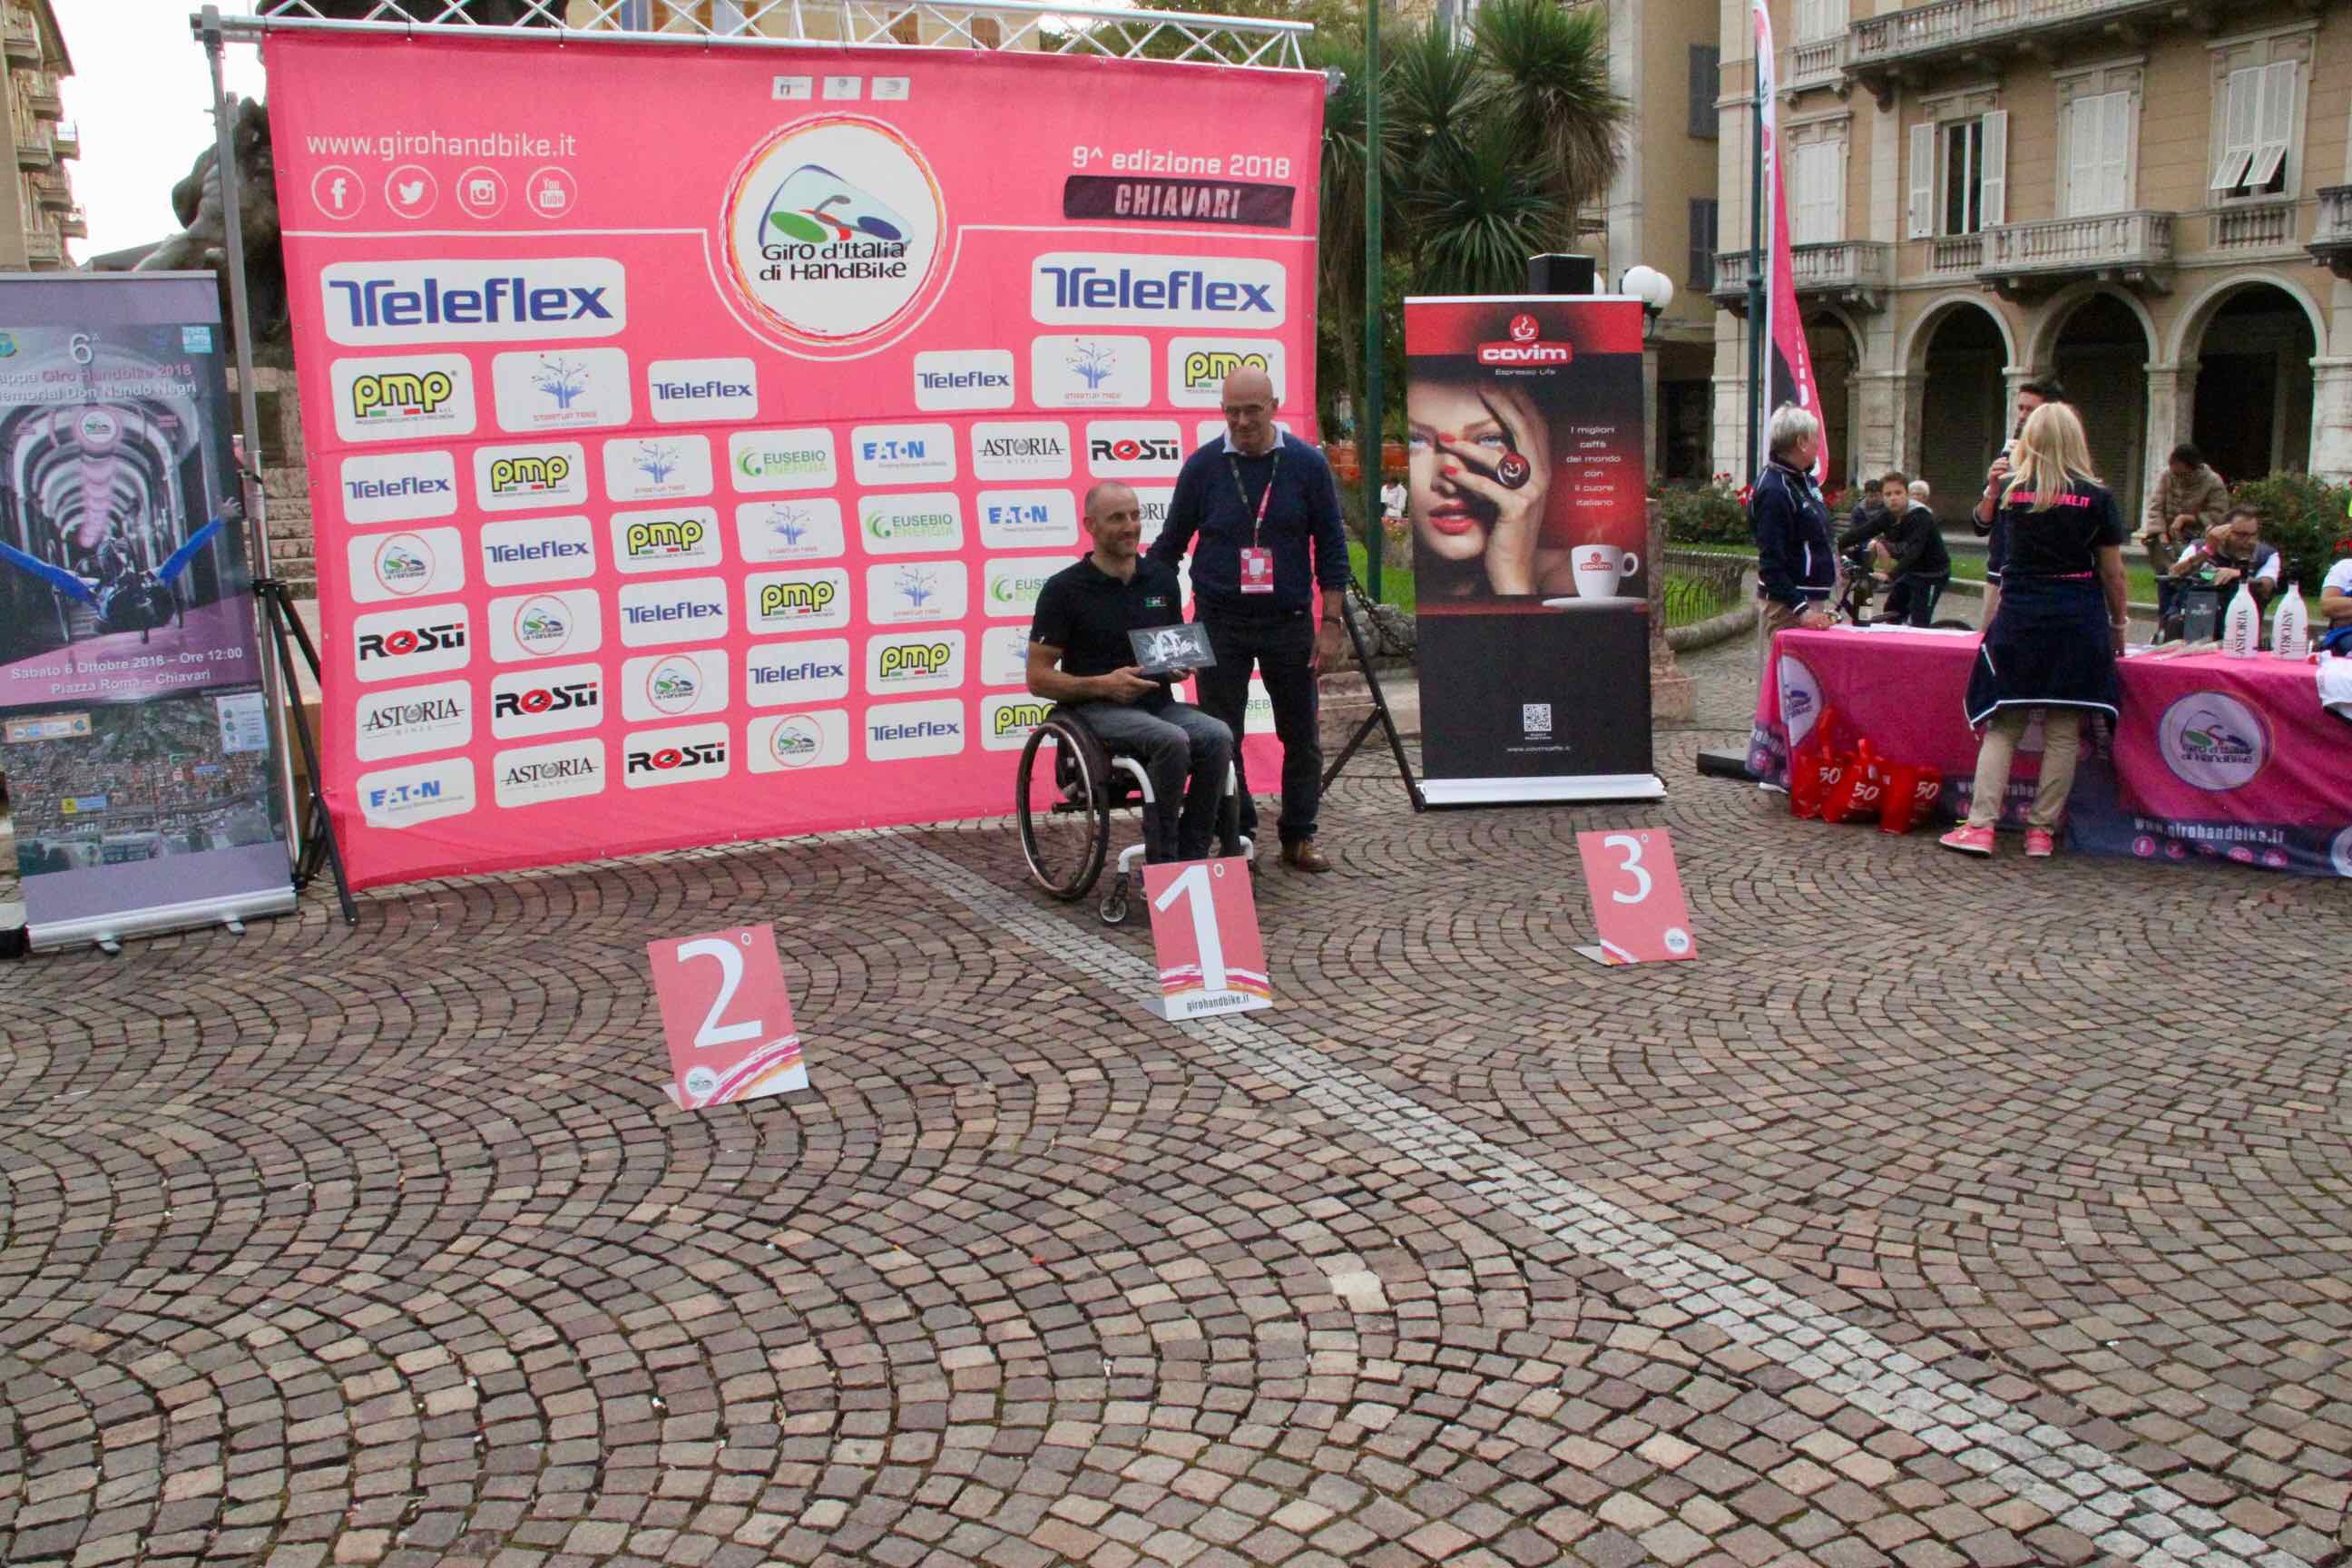 1° Memorial don Nando Negri a Chiavari per il Giro d'Italia Handbike 2018 - 24